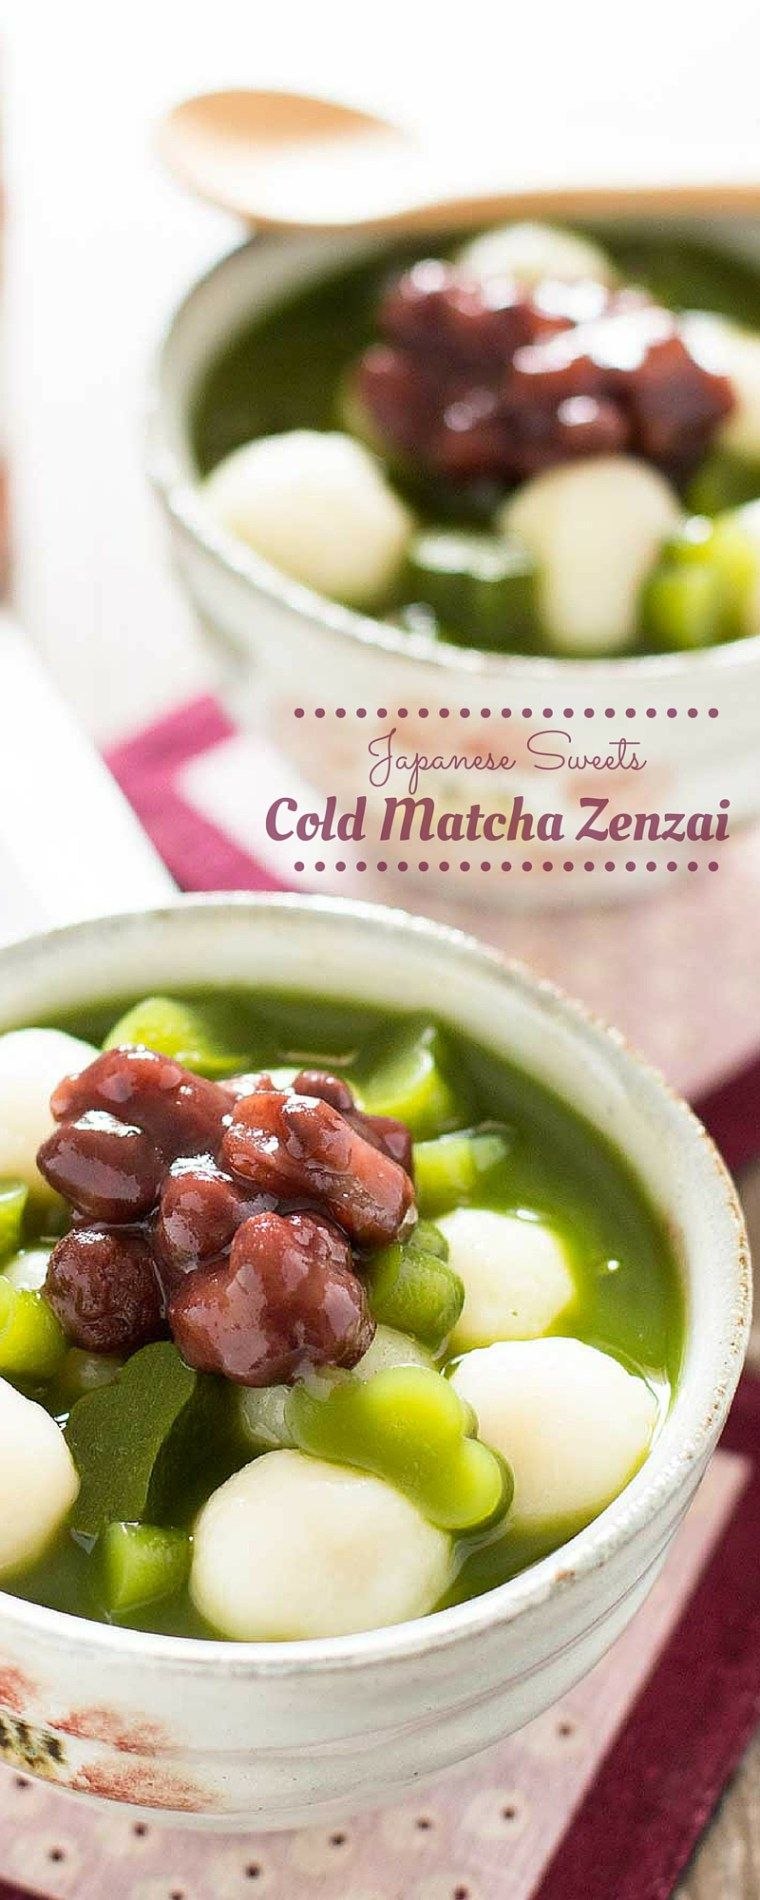 Cold Matcha Zenzai Green tea recipes, Green tea dessert